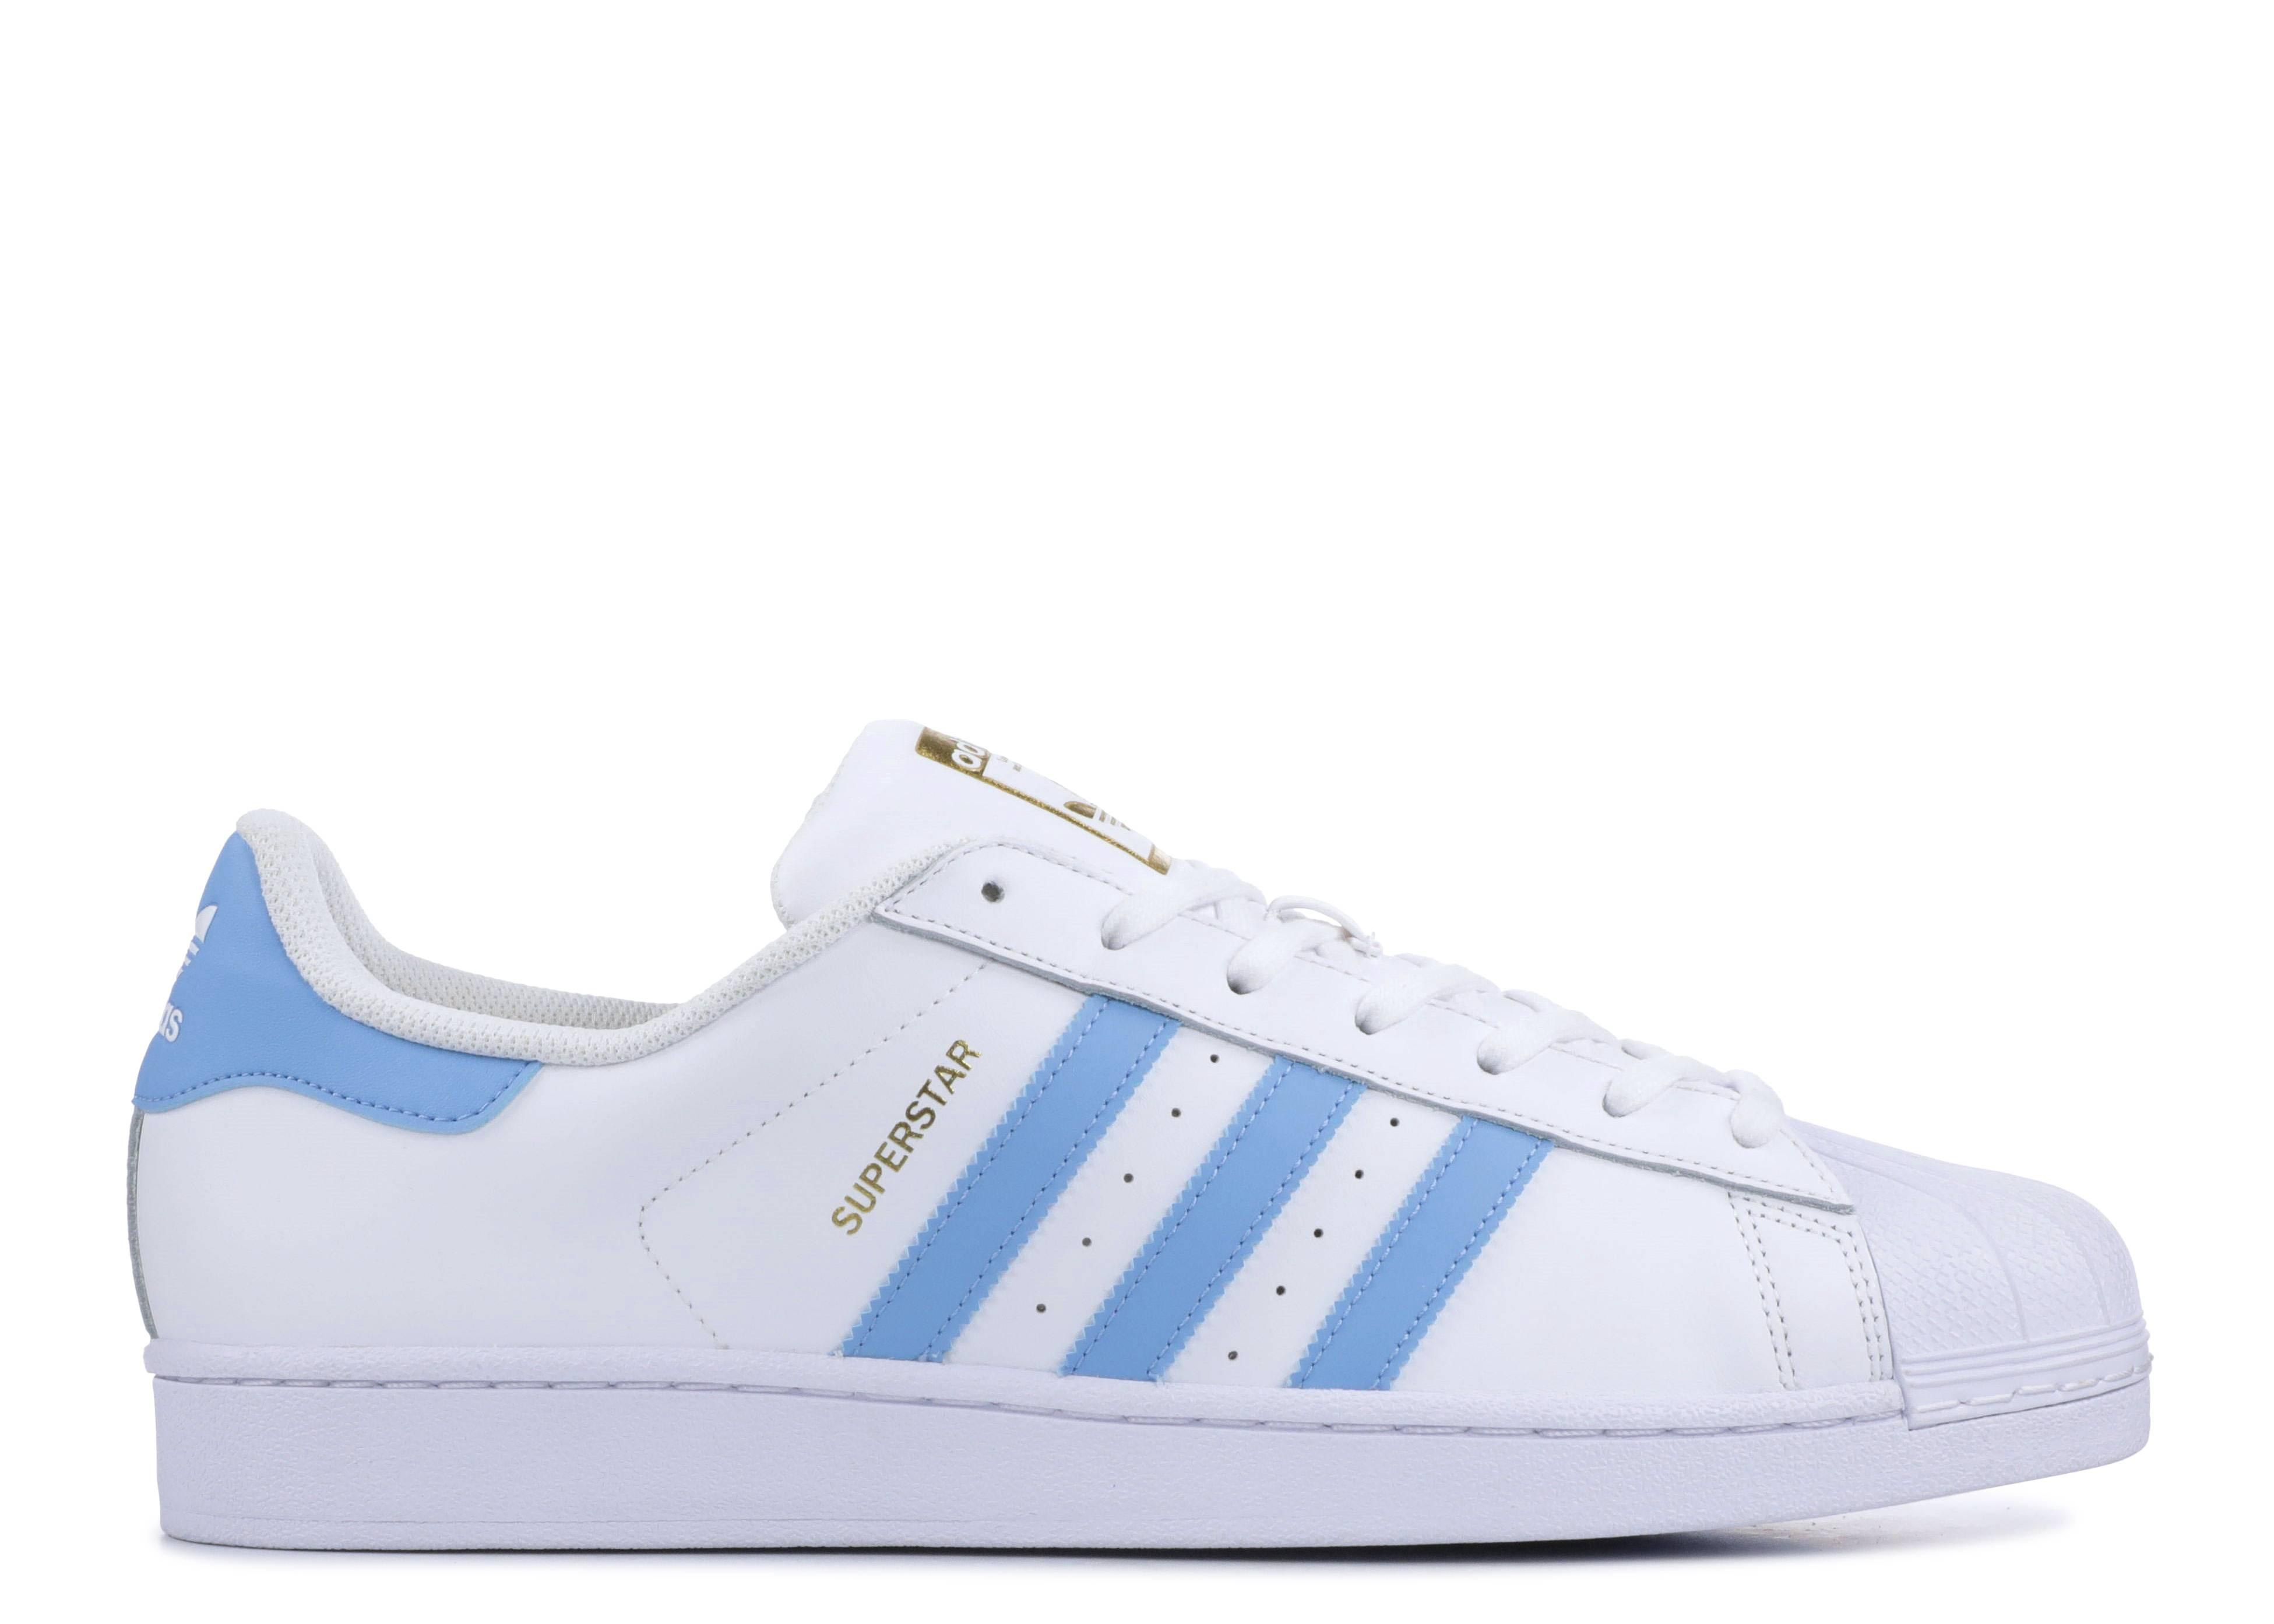 Adidas Originals Superstar Foundation White//Blue BY3716 Mens Causal Shoes